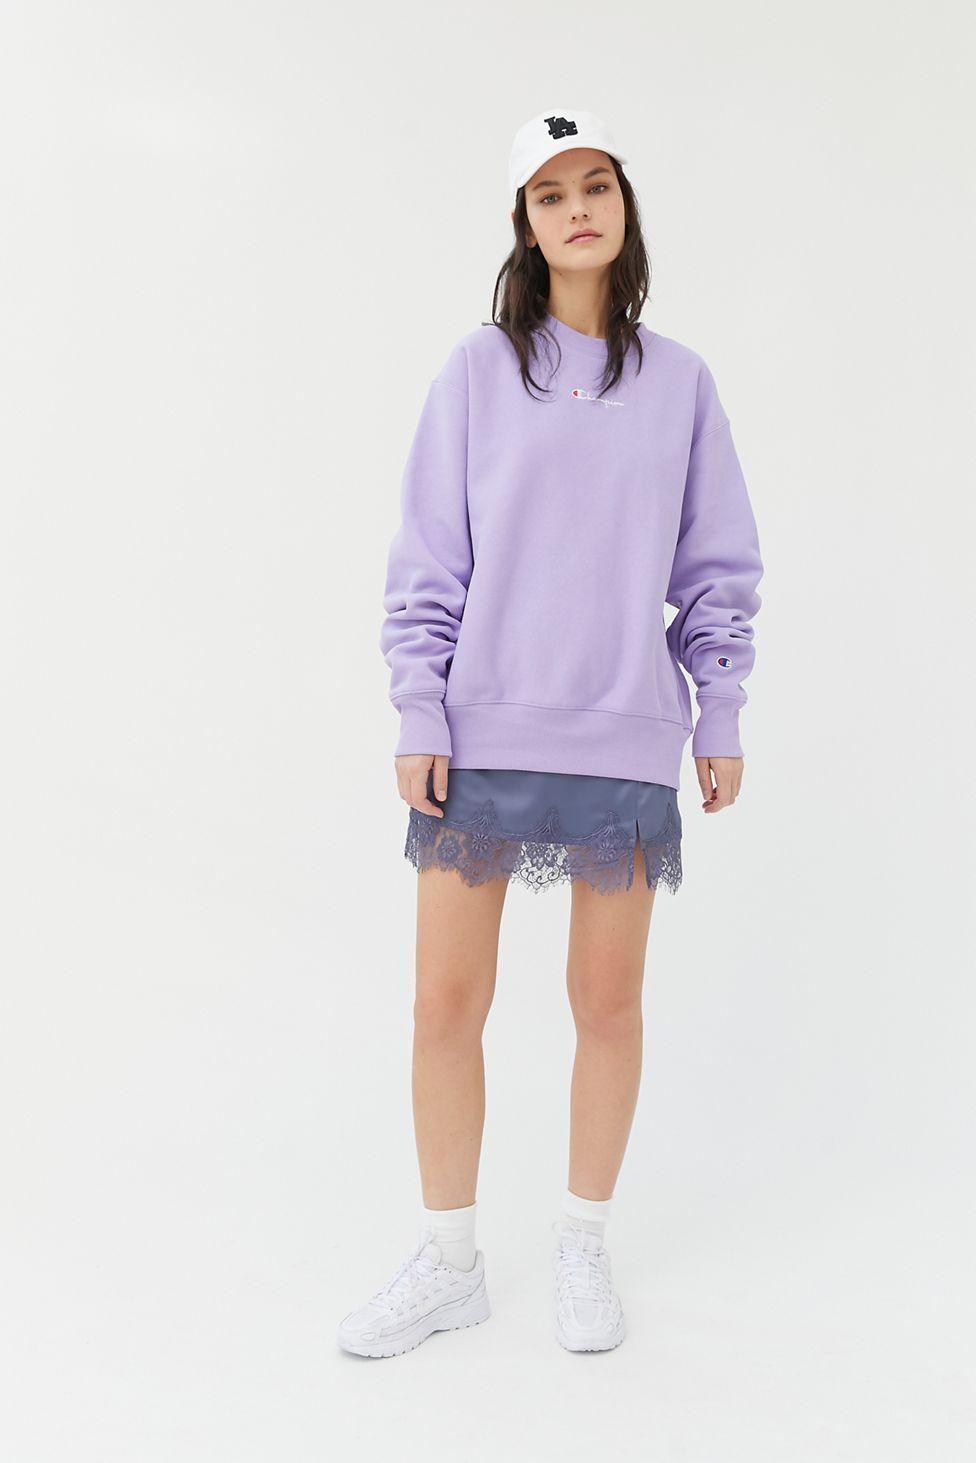 Champion Uo Exclusive Boyfriend Crew Neck Sweatshirt Urban Outfitters [ 1463 x 976 Pixel ]